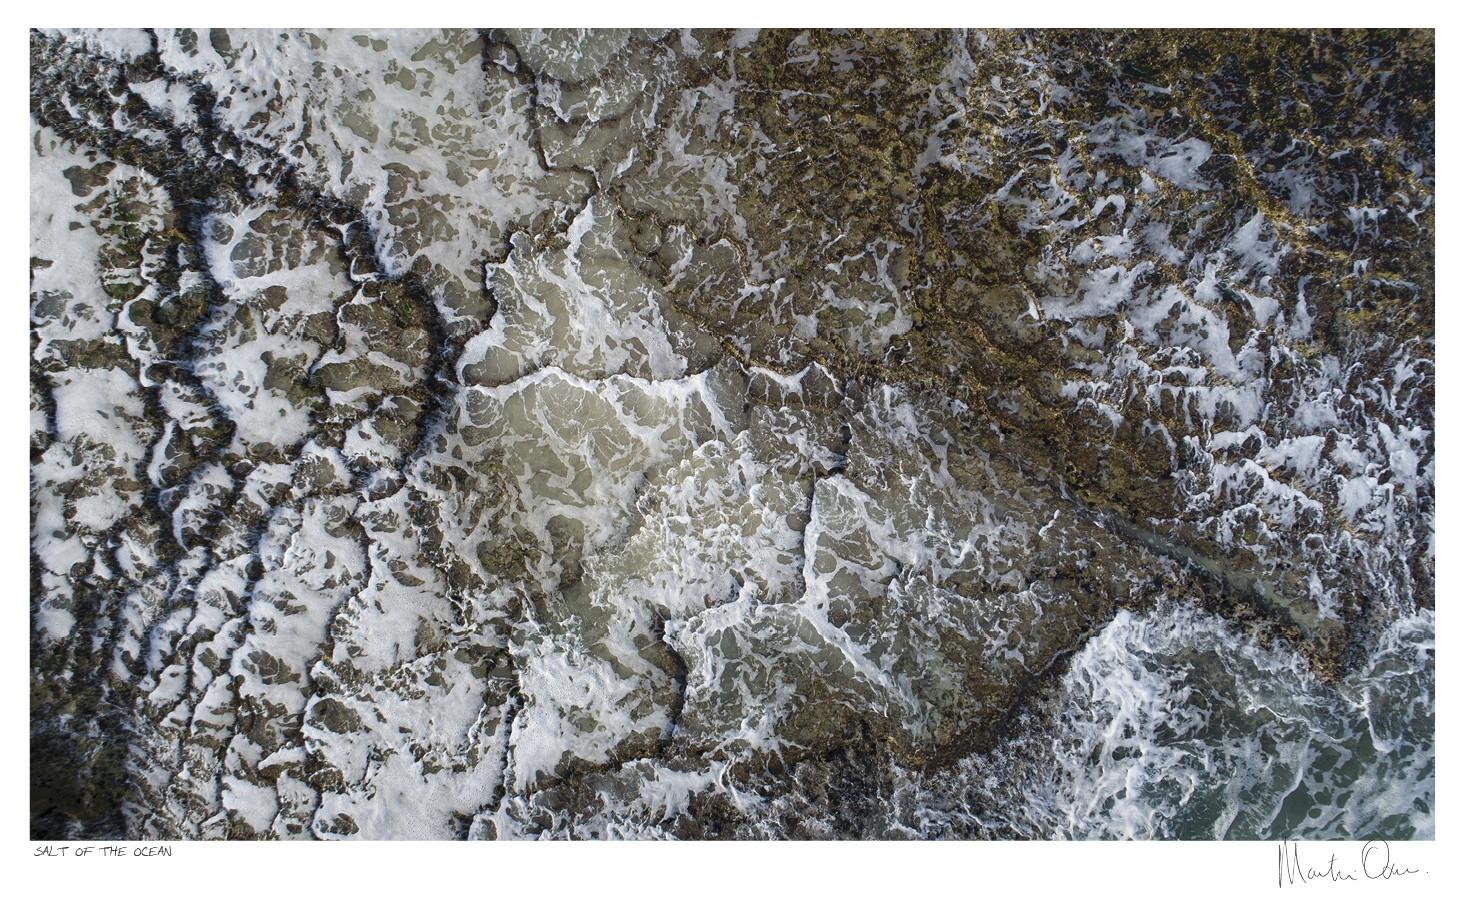 From Above | Salt of the Ocean | Martin Osner